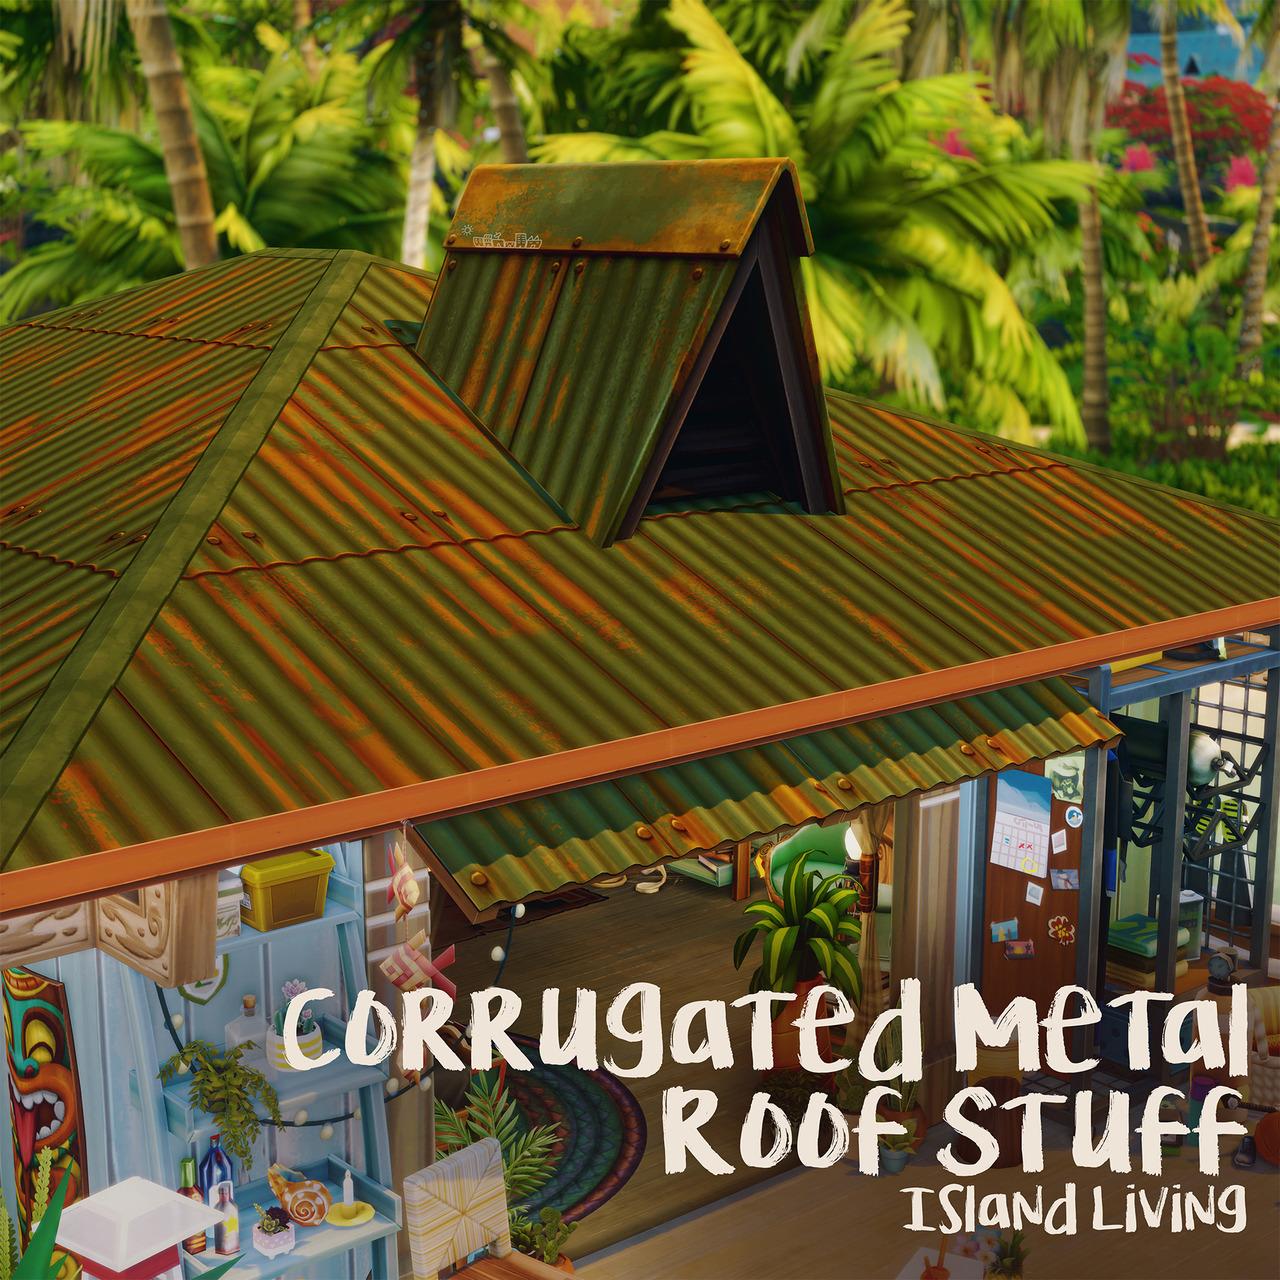 corrugated metal roof stuff